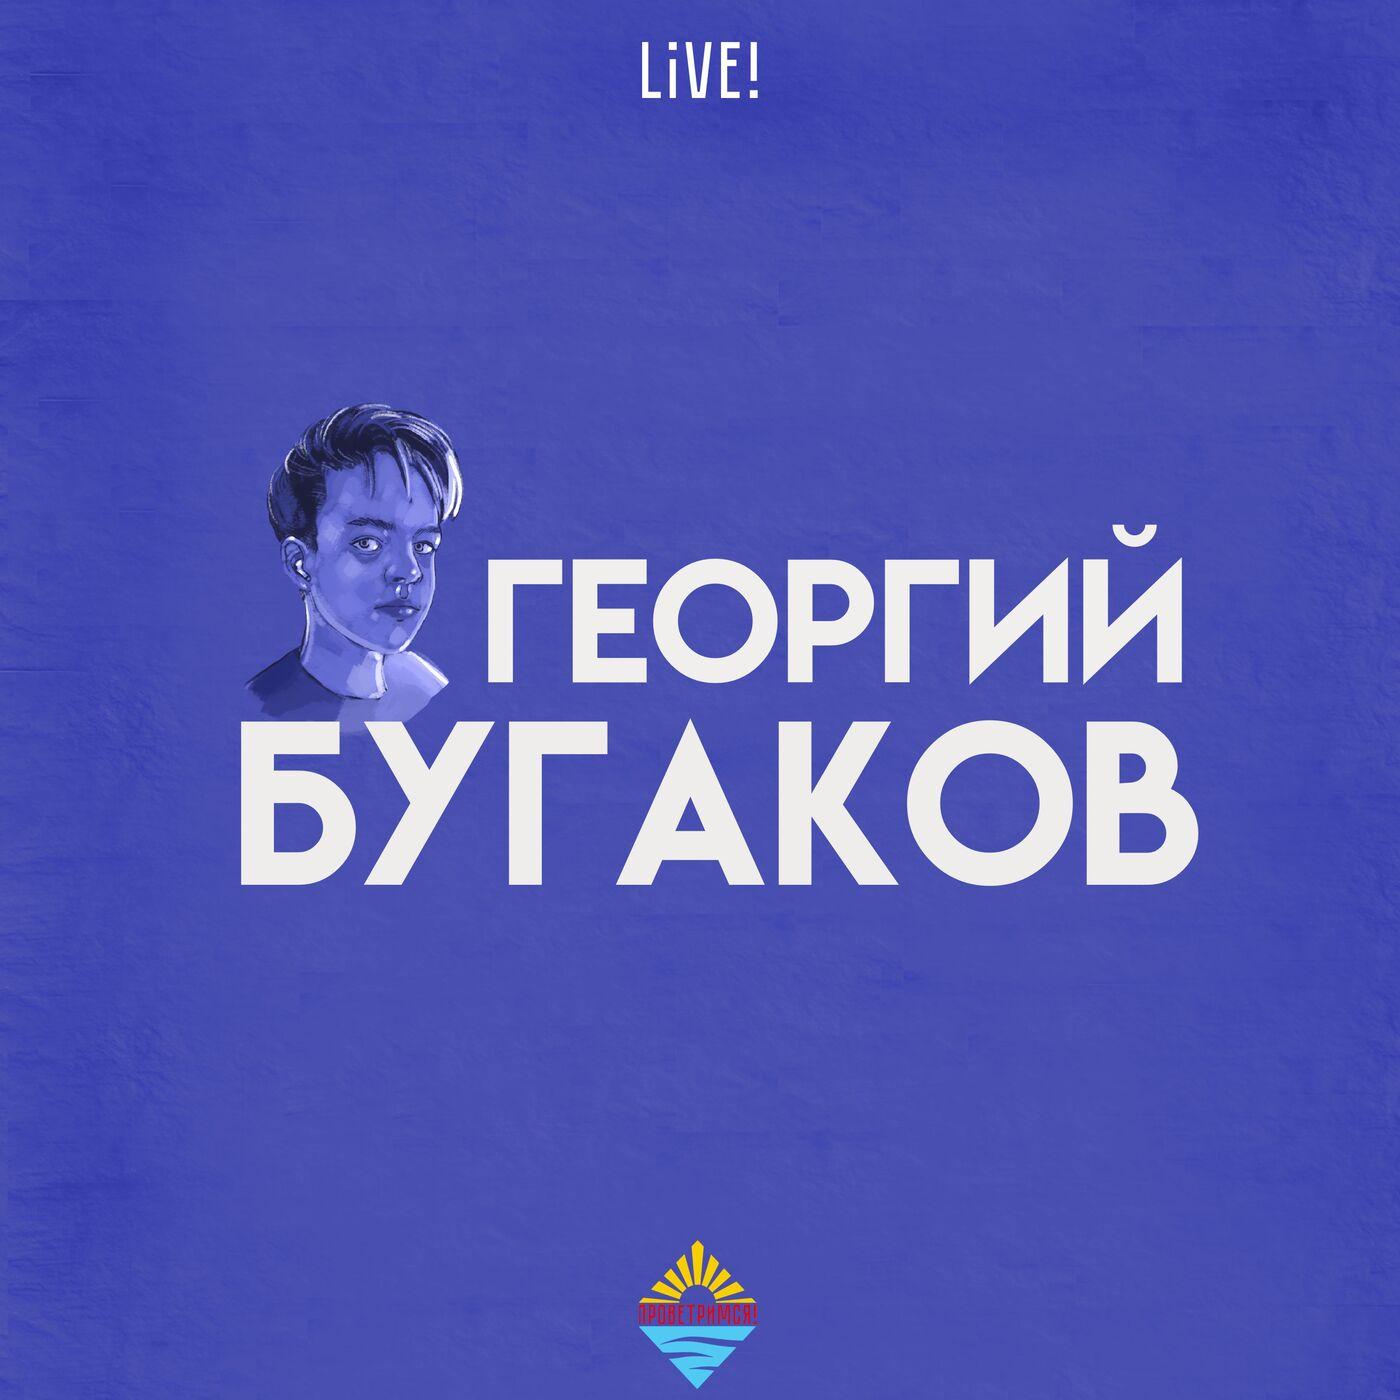 Георгий Бугаков live!